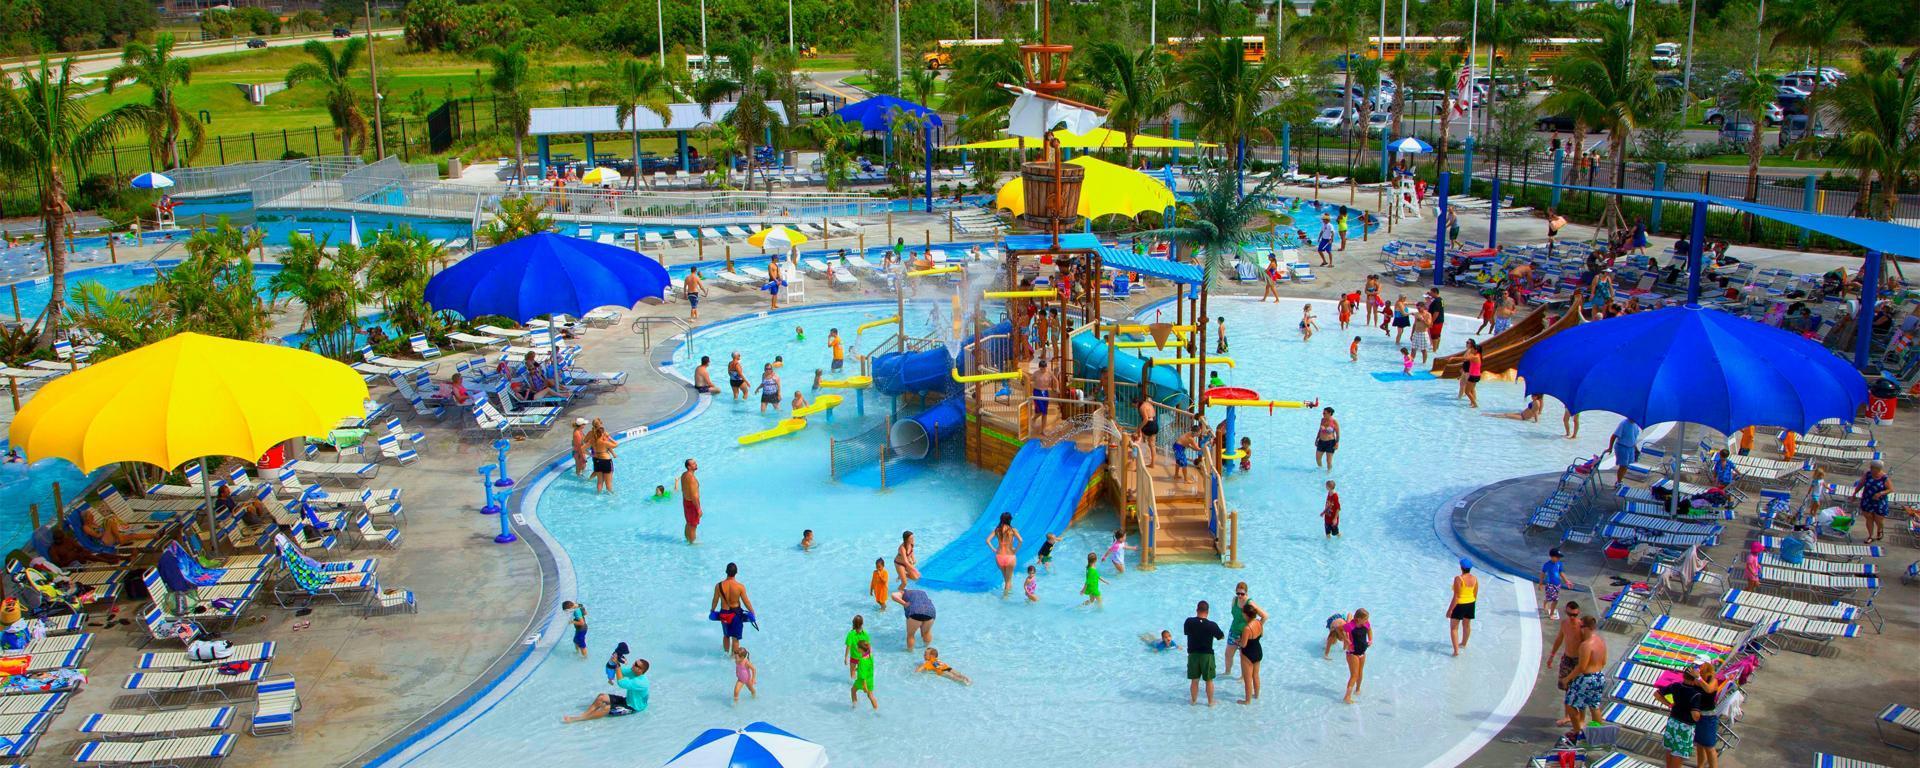 Overview of Sailfish Splash Waterpark